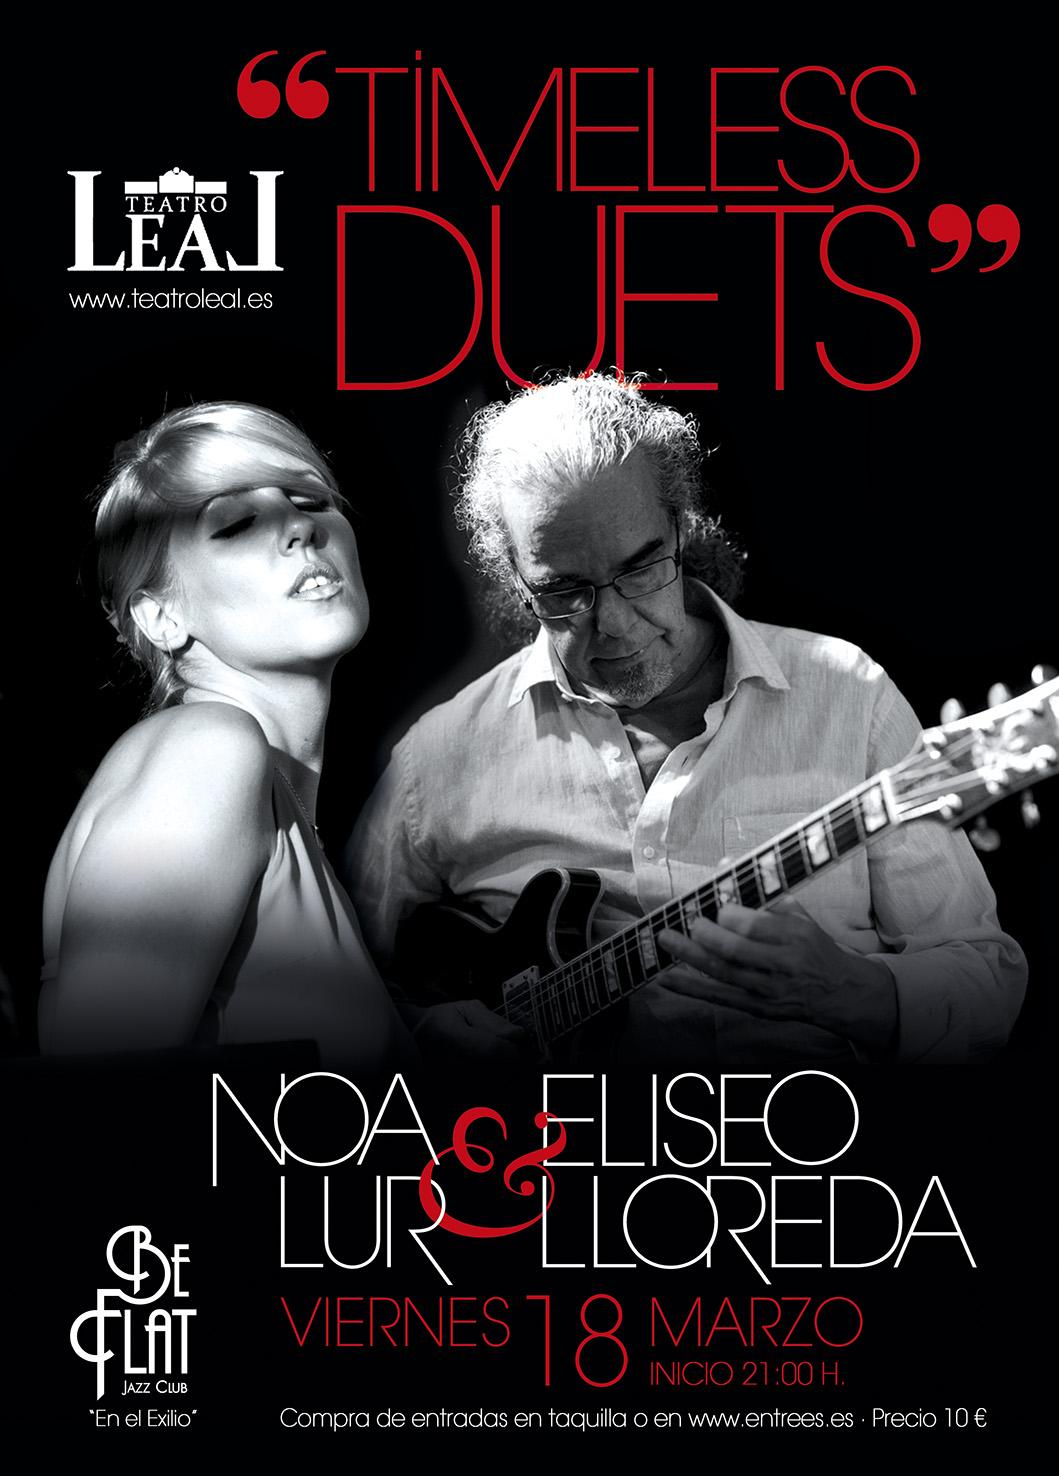 NOA LUR + ELISEO LLOREDA marzo 2016 mail.jpg